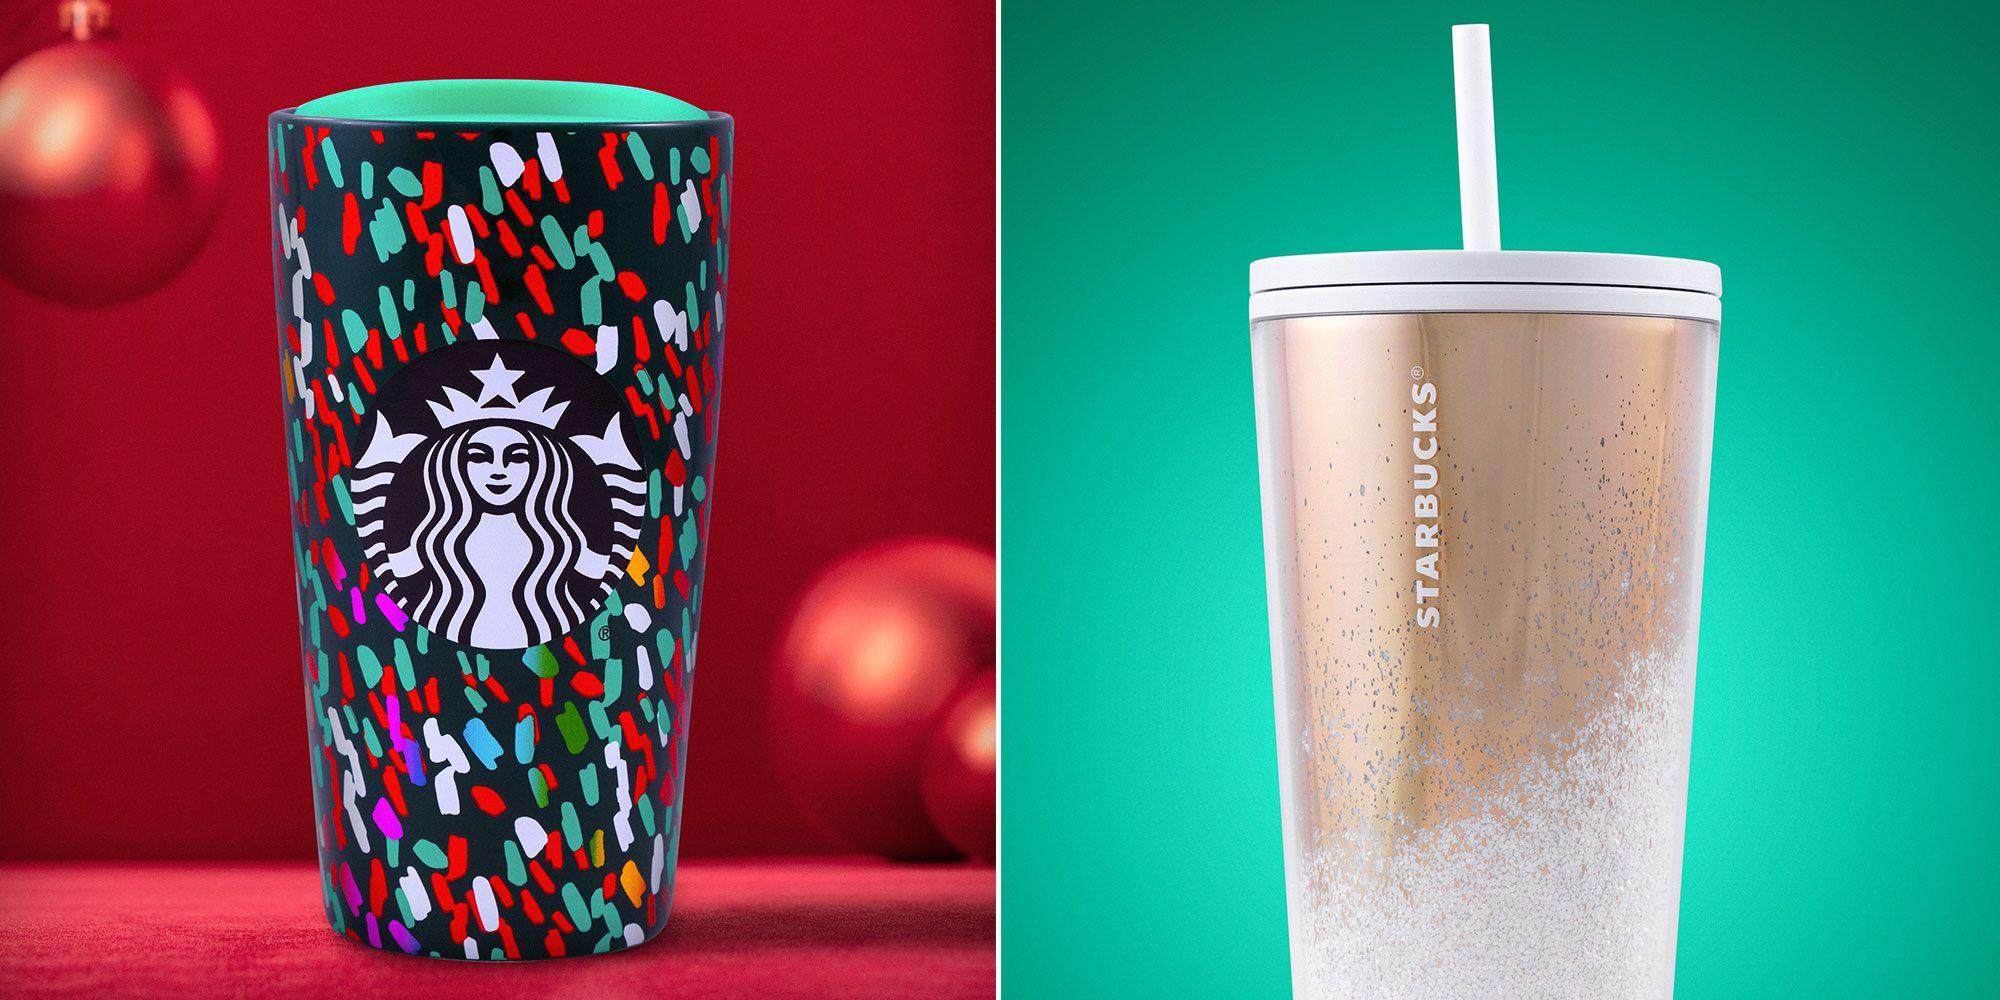 Starbucks Holiday Tumbler Sneak Peak Starbucks Holiday